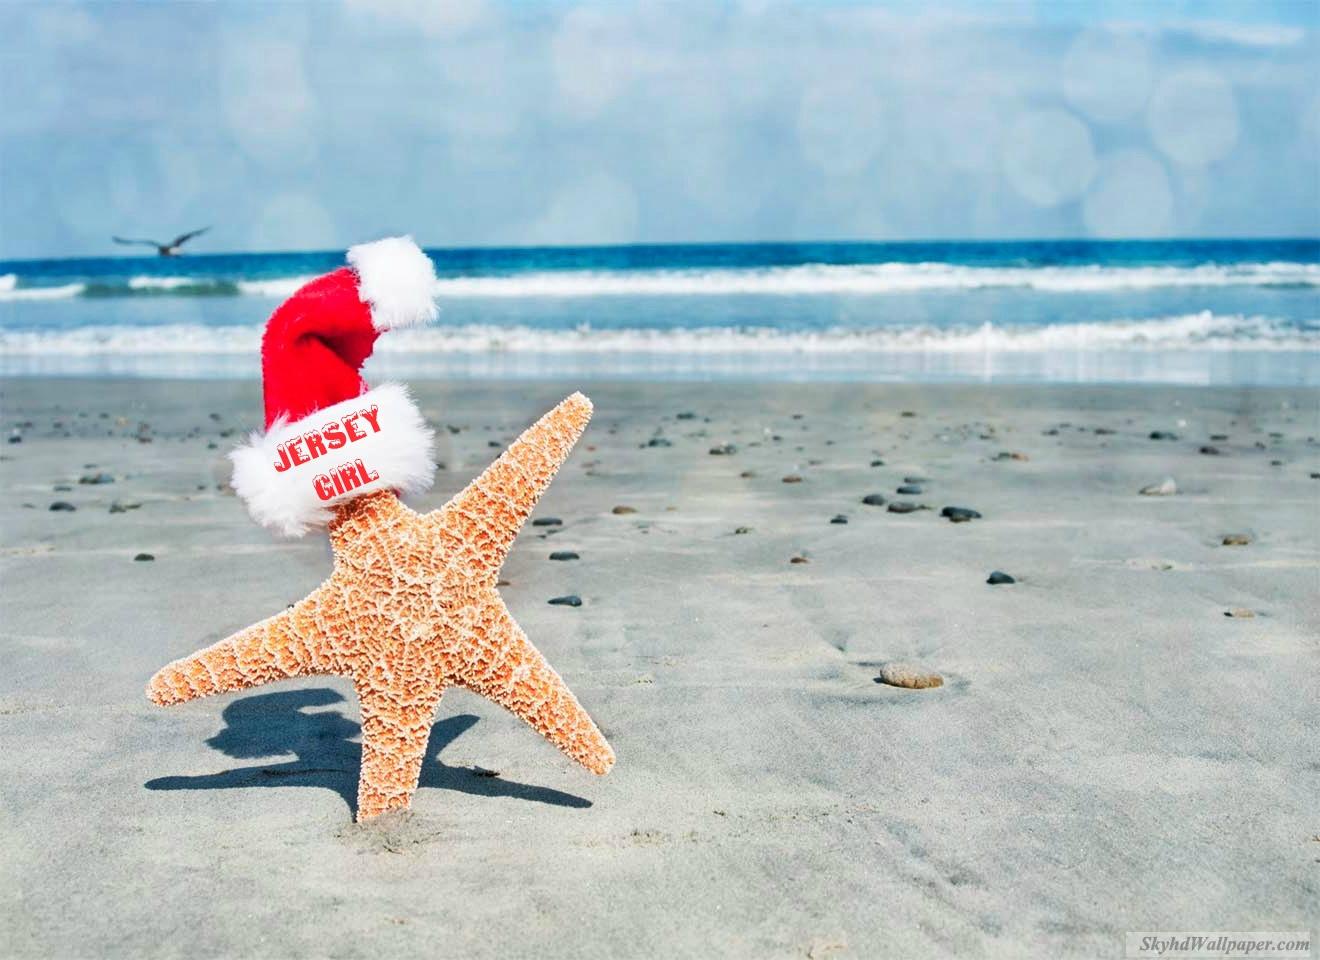 JERSEY GIRL CHRISTMAS HAT STARFISH